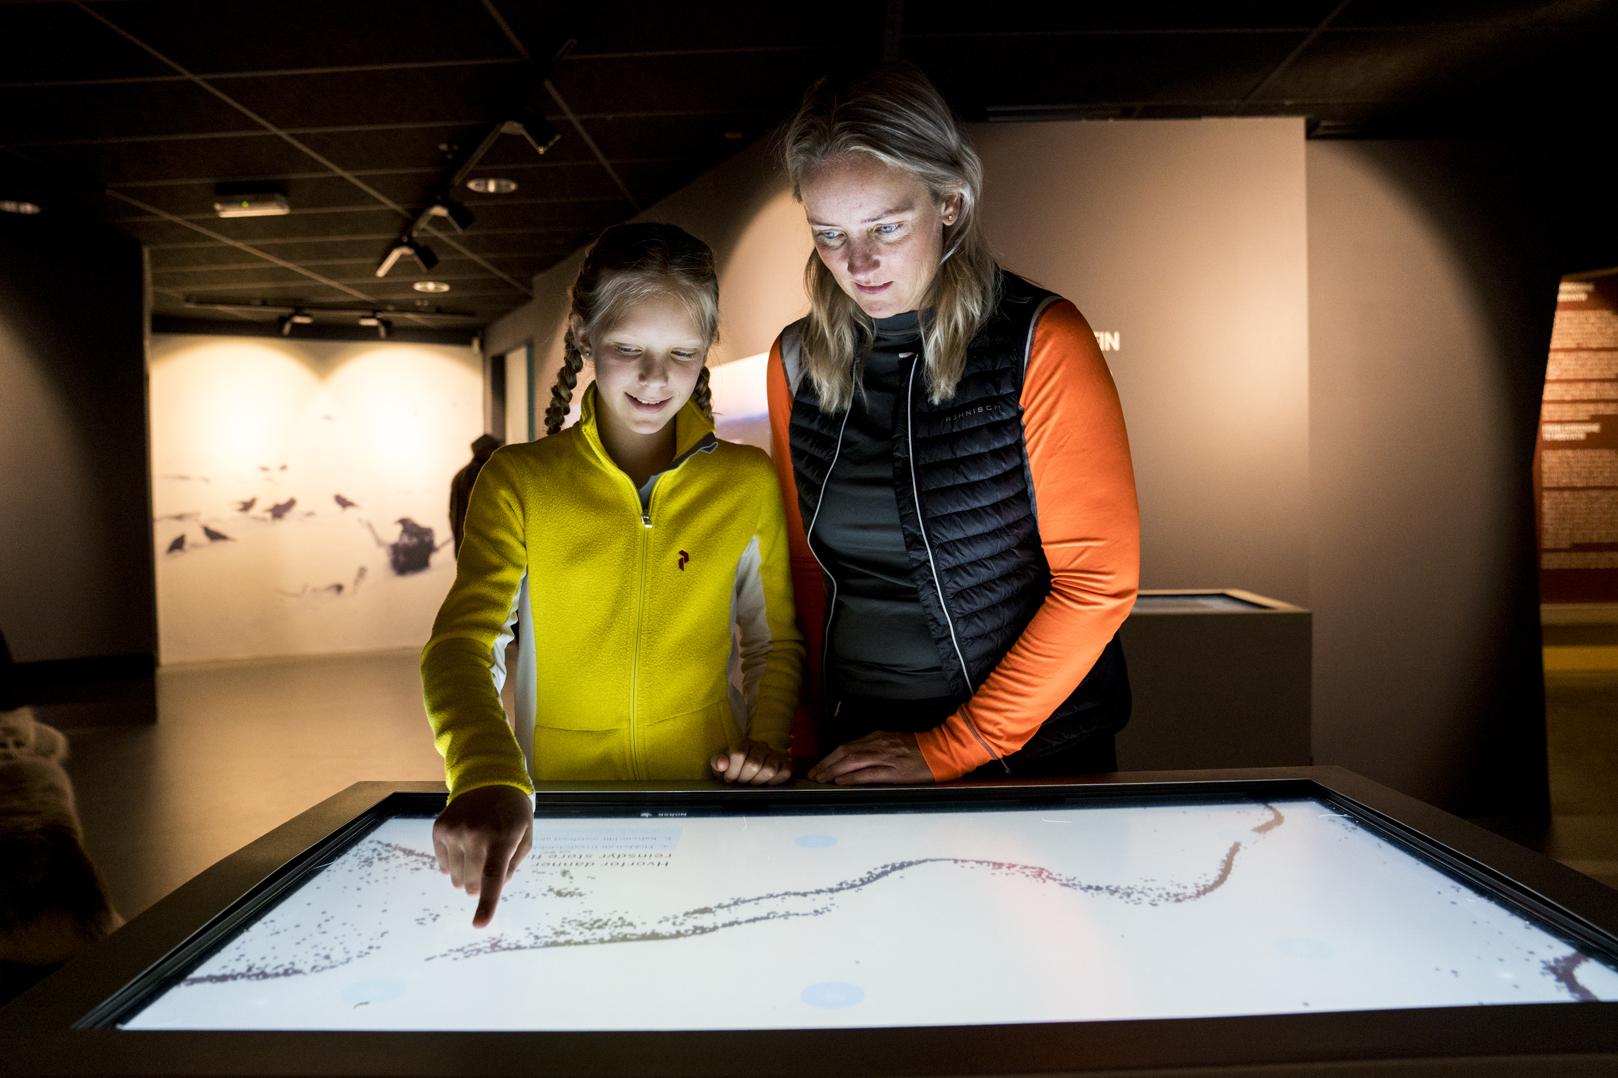 Hardangervidda nasjonalparksenter interaktivutstilling